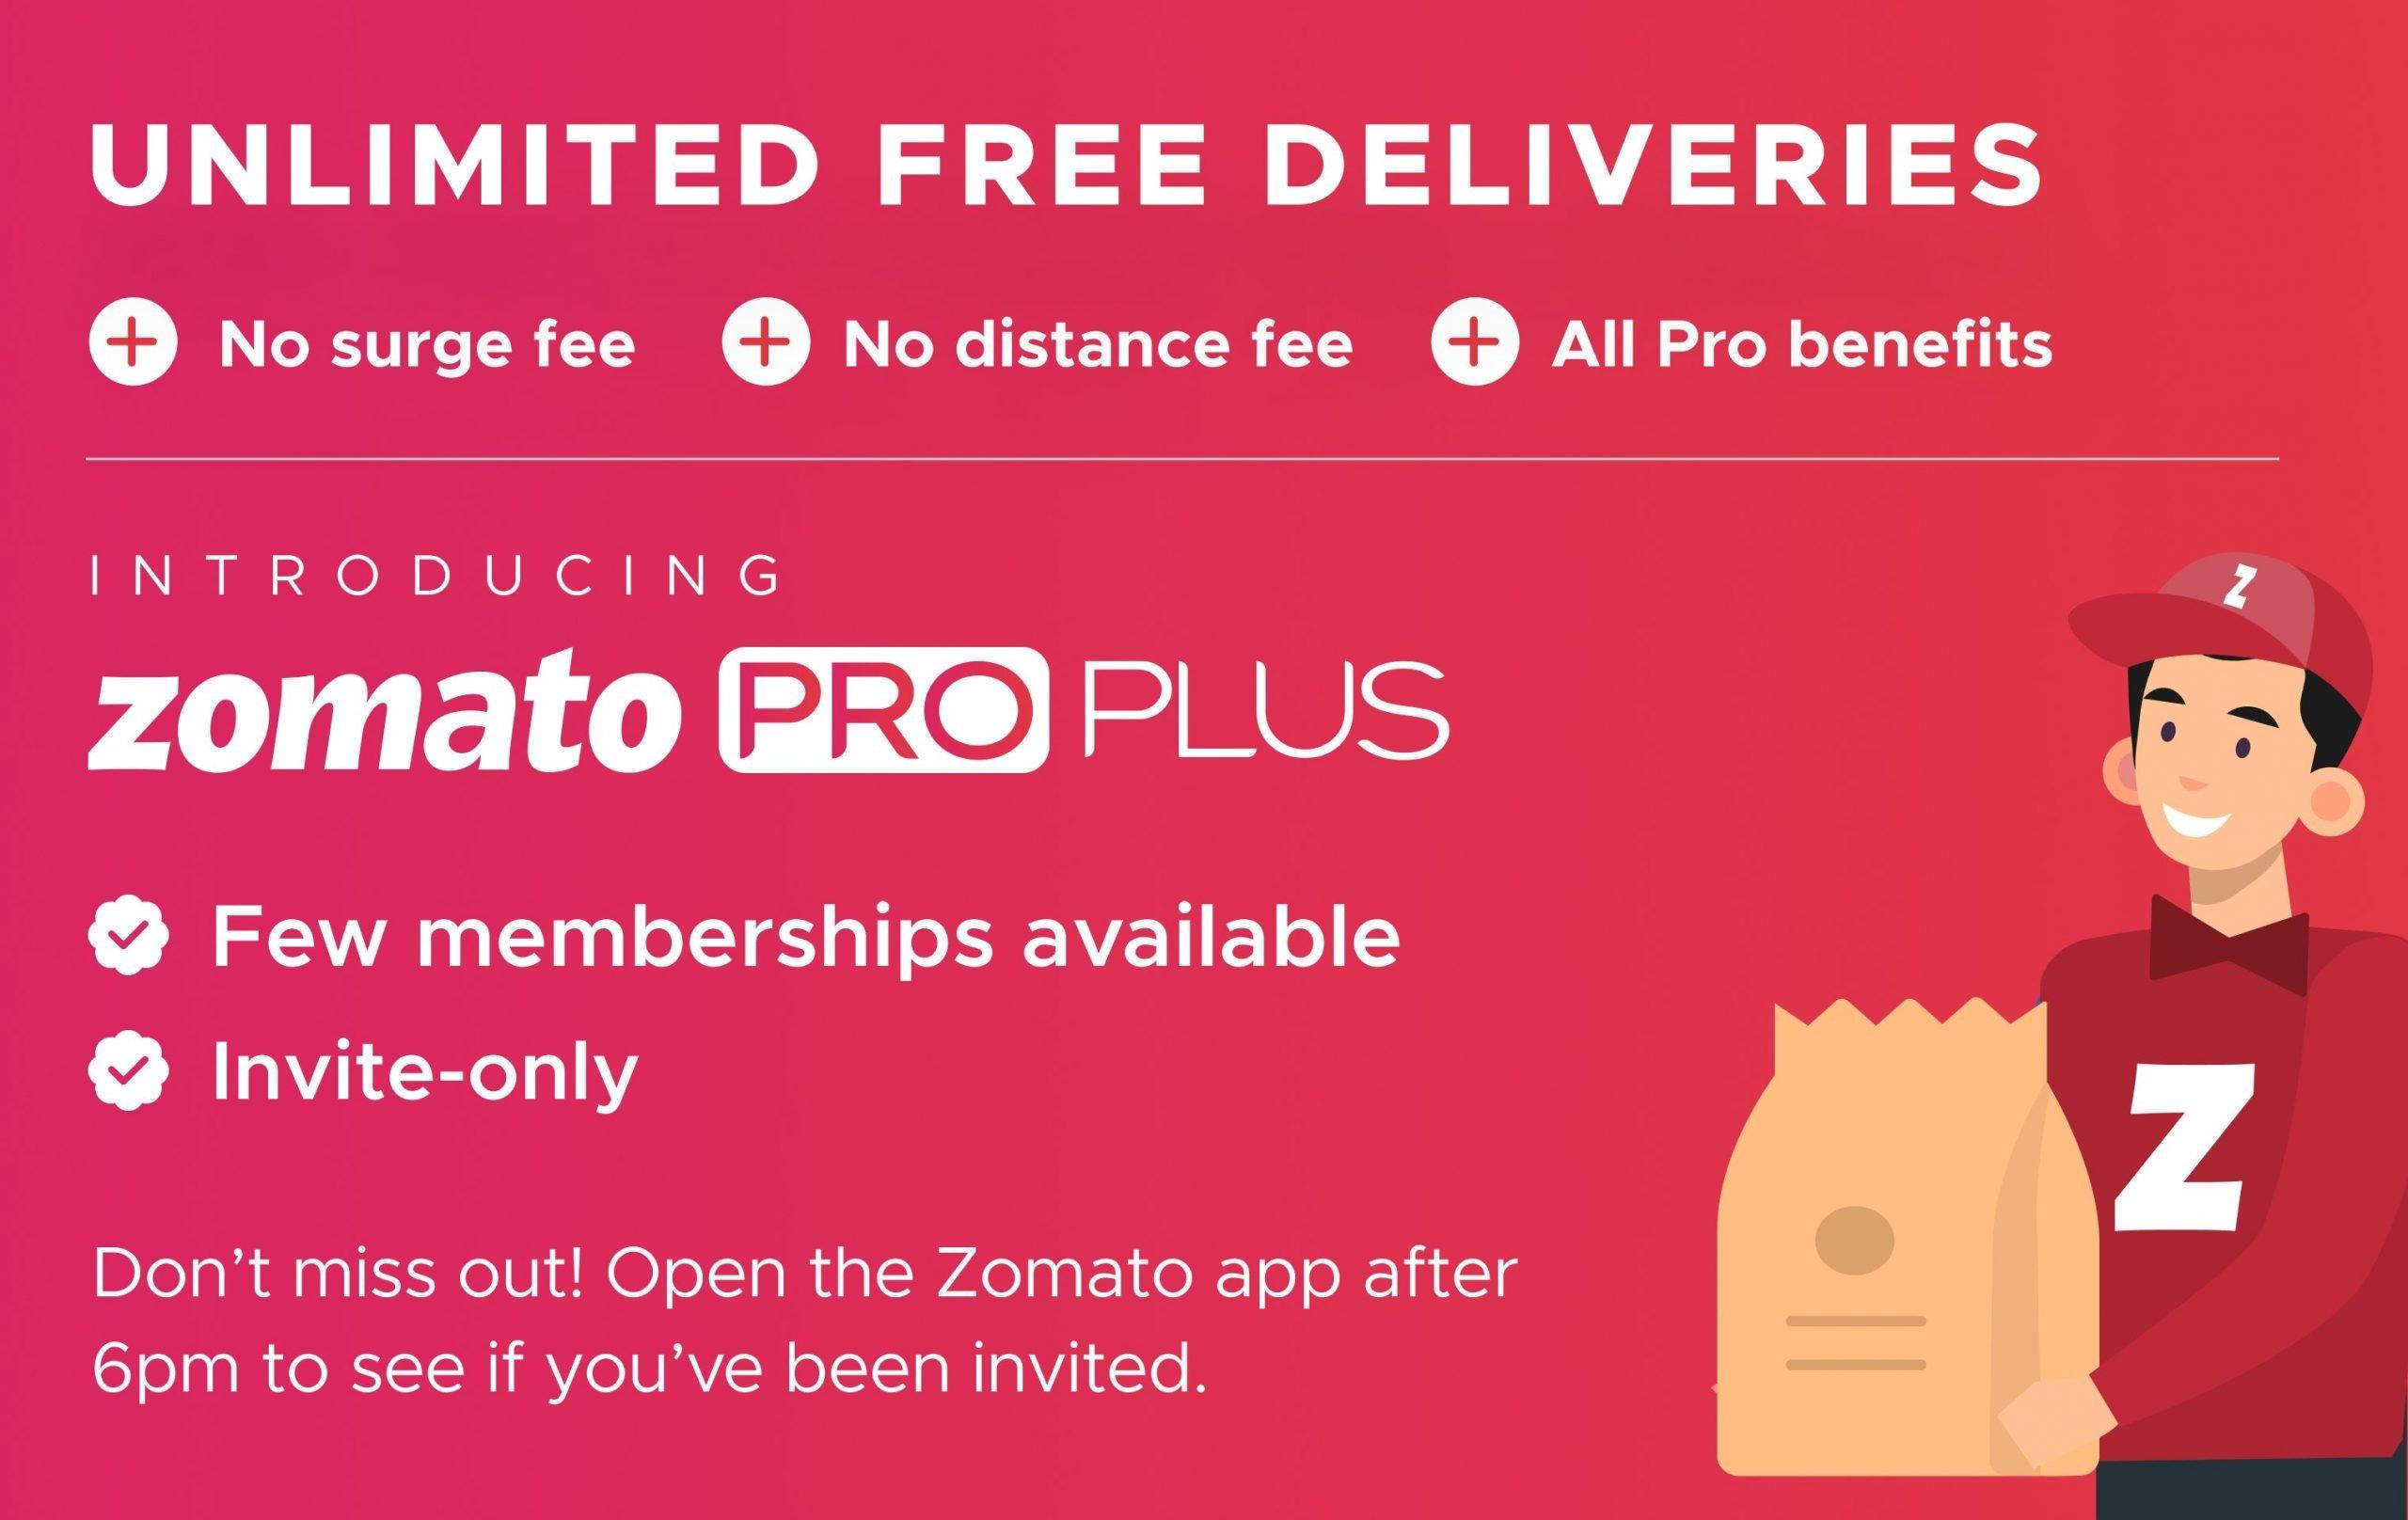 Zomato Pro Plus Membership